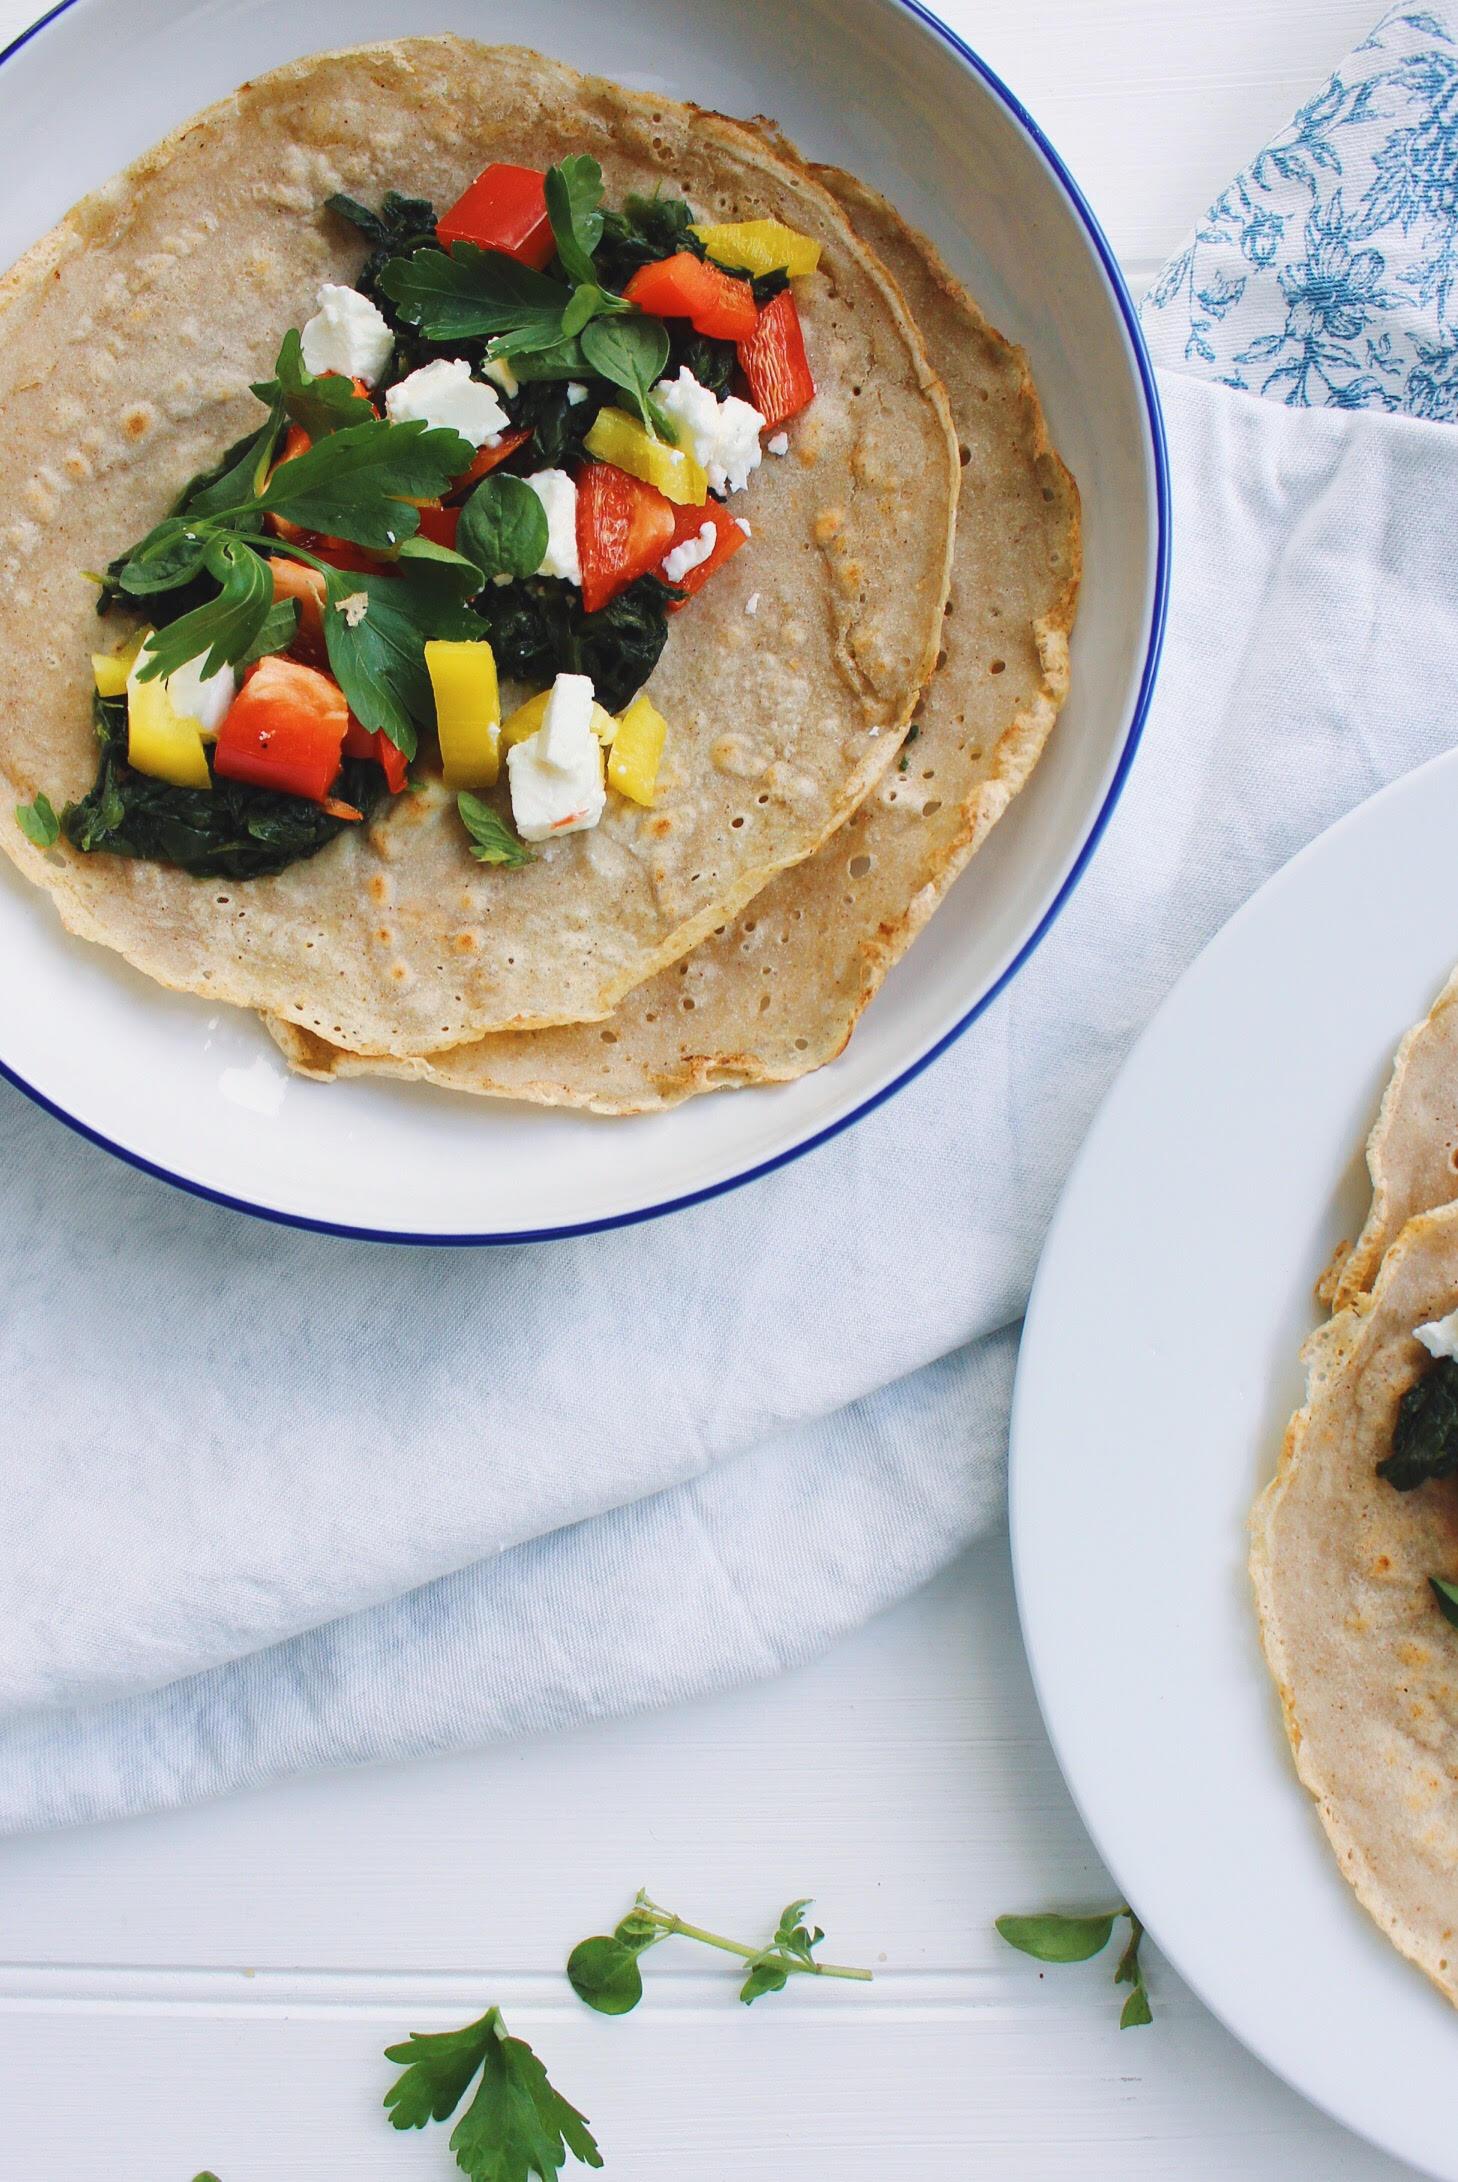 Low FODMAP recipe buckwheat crepes